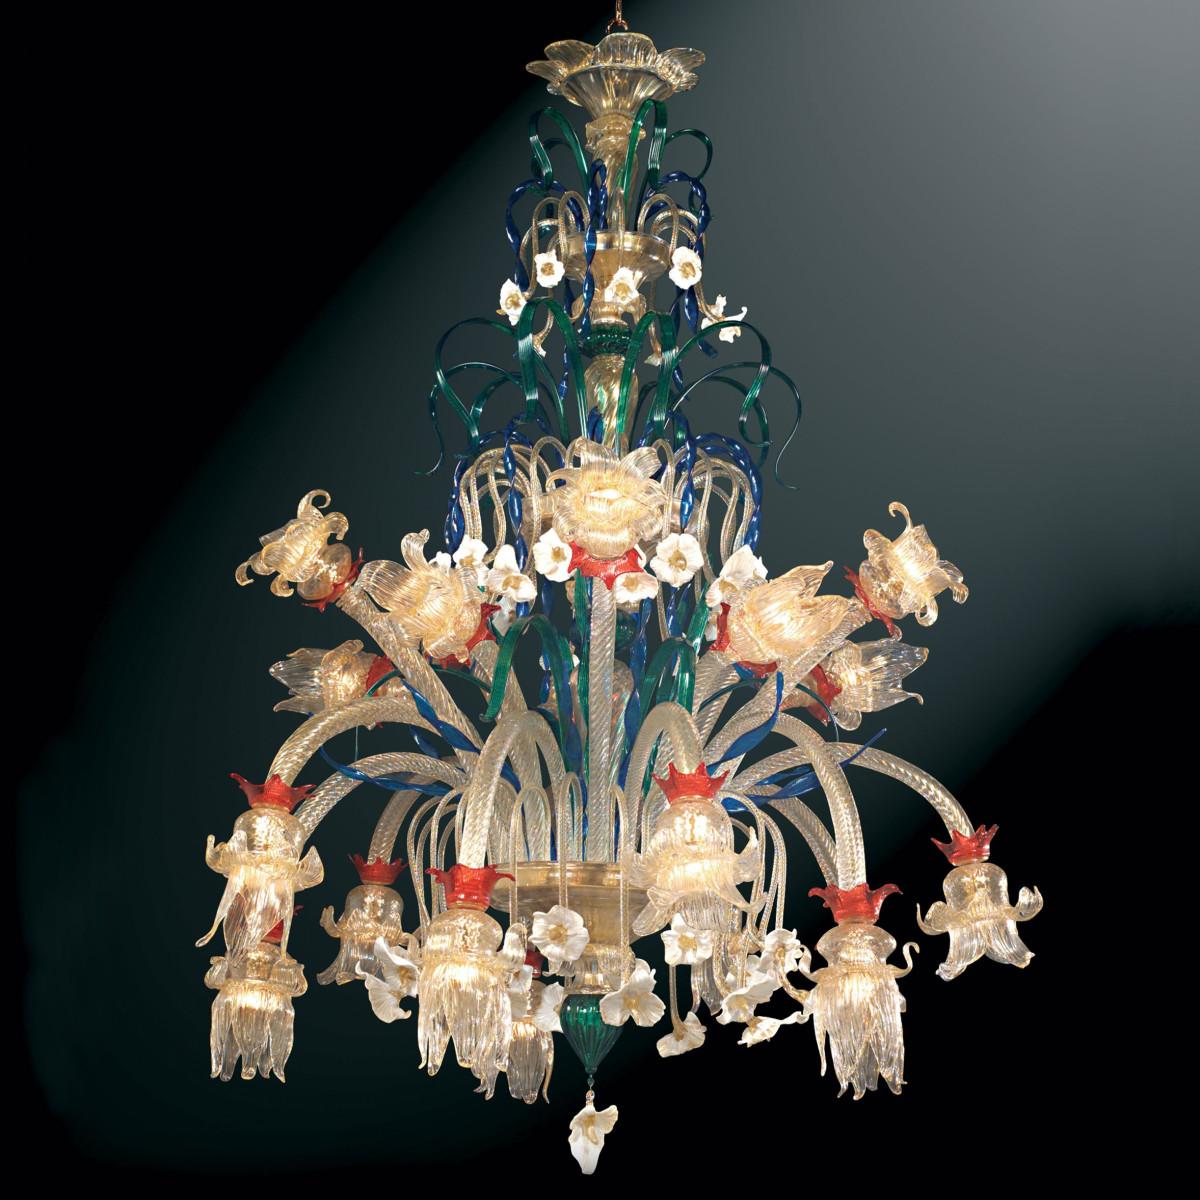 """Immacolata"" Murano glass chandelier - 20 lights - multicolor"